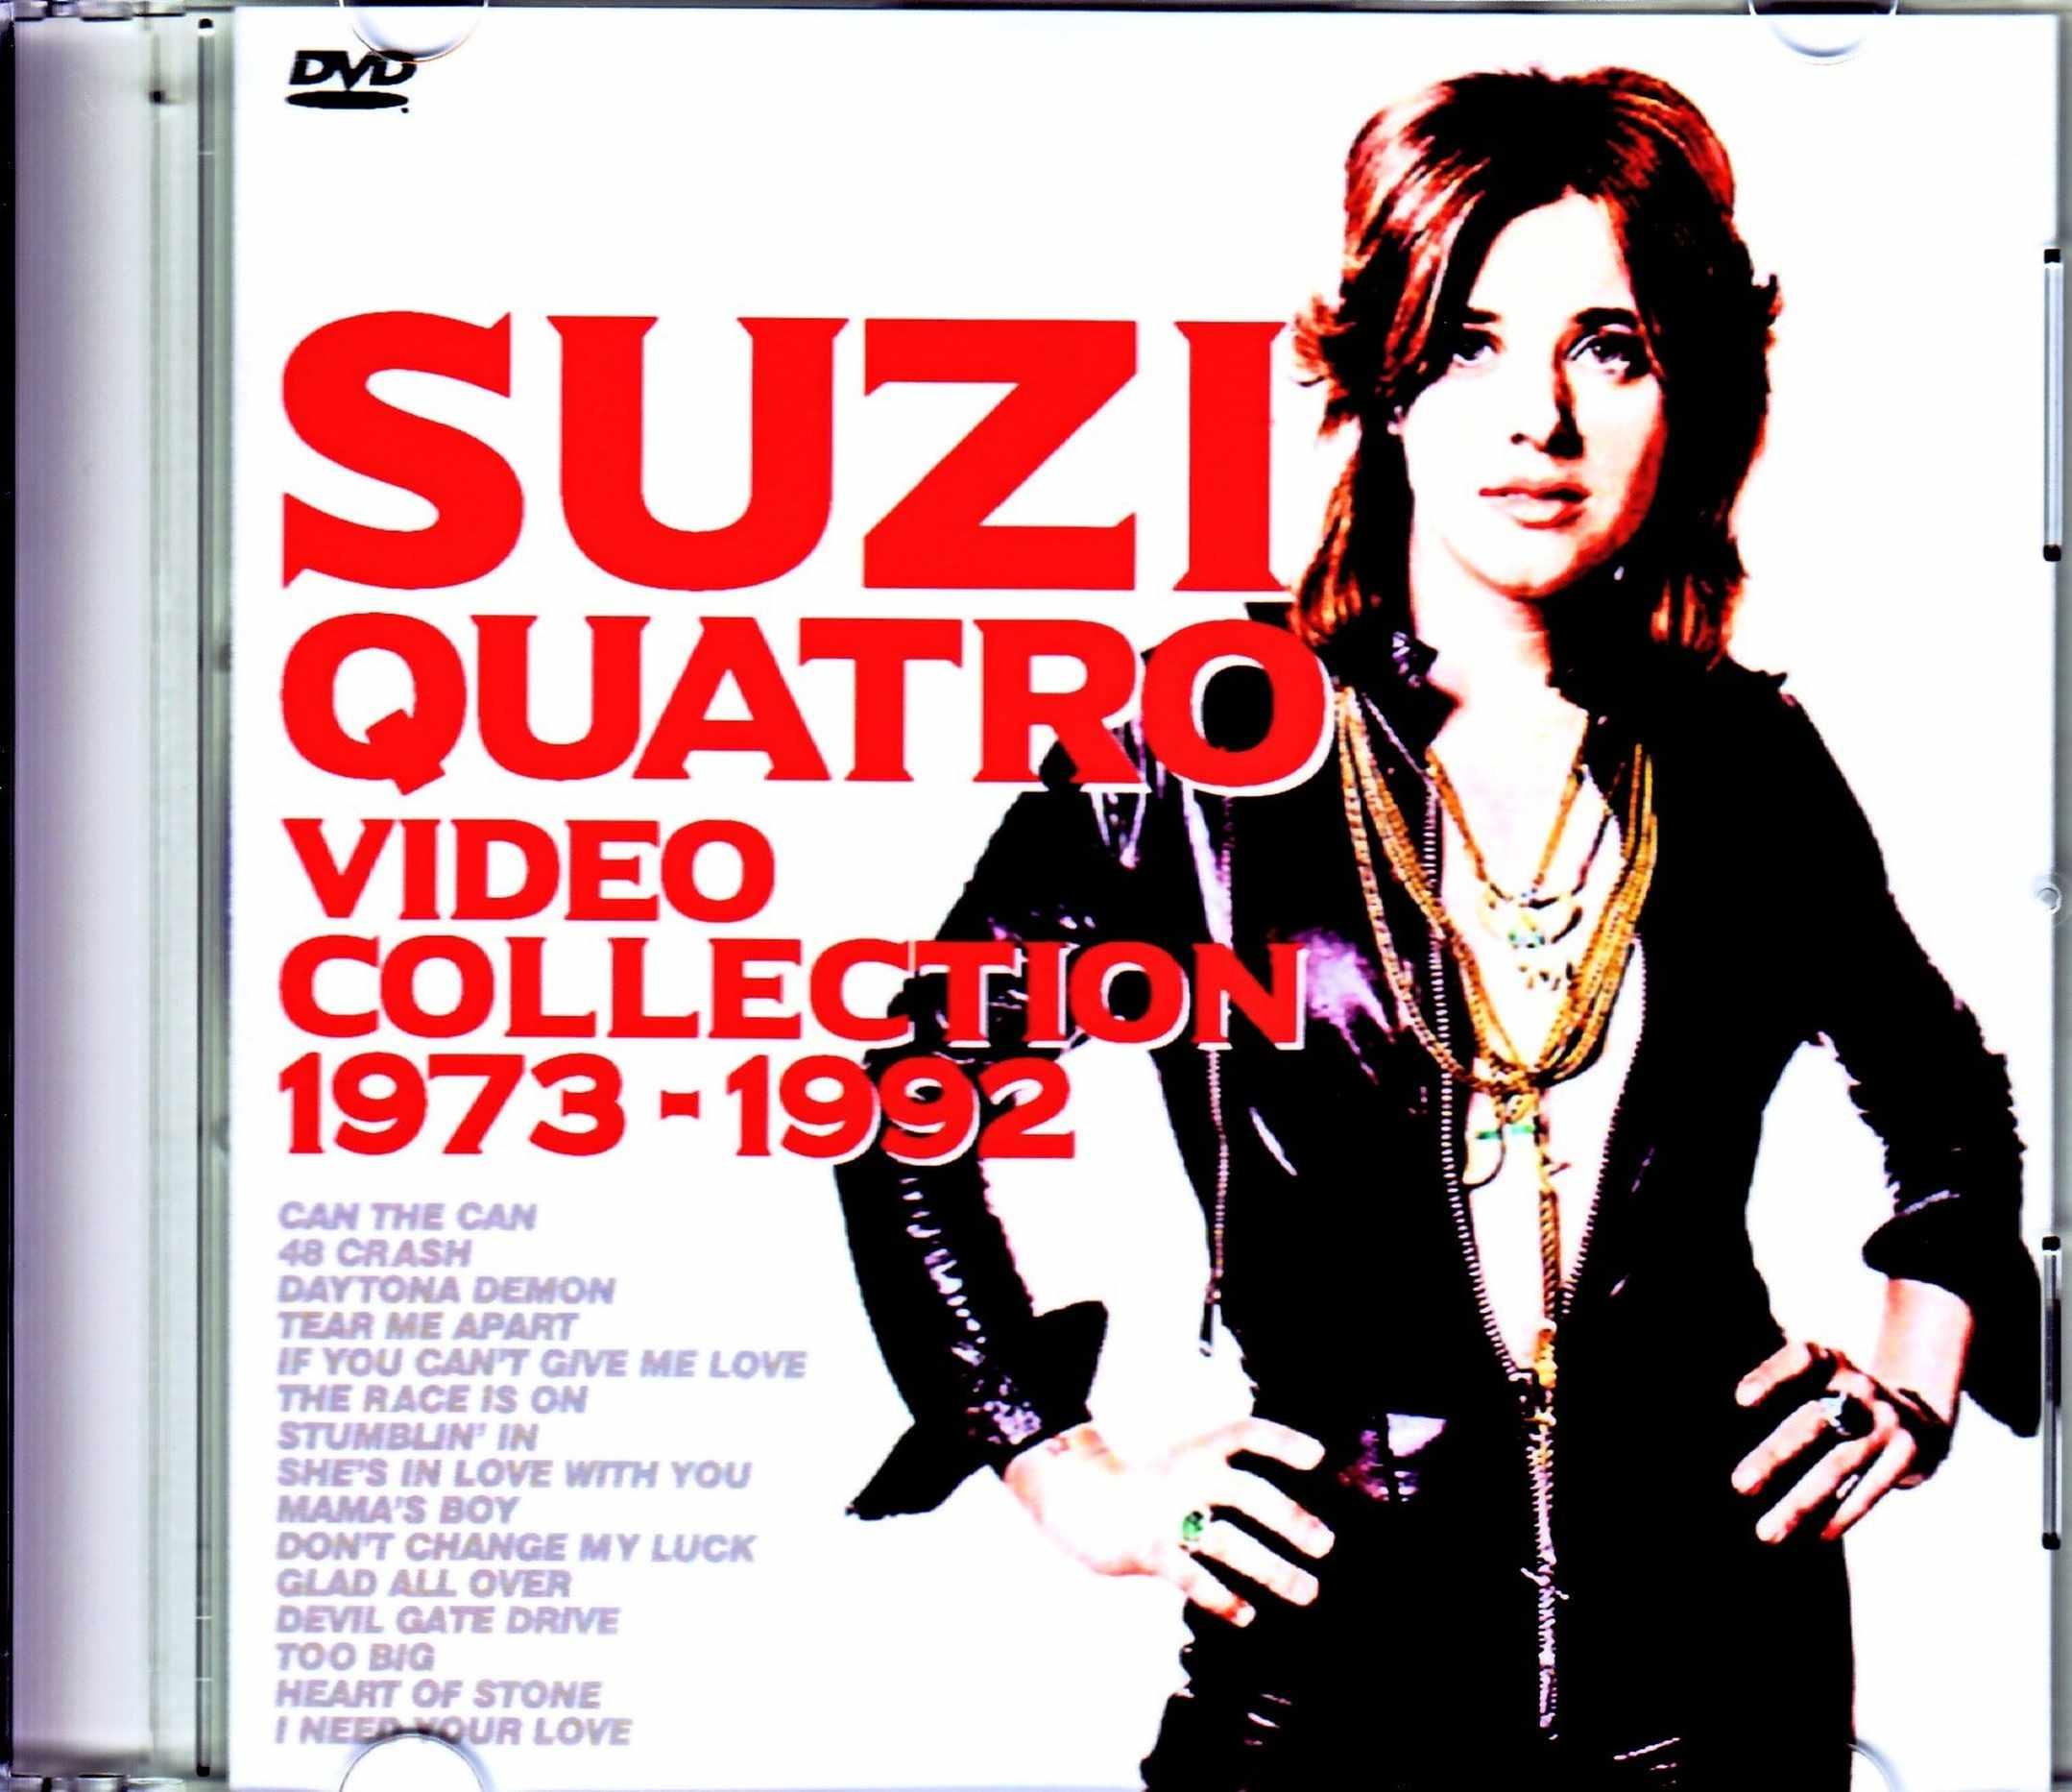 Suzi Quatro スージー・クワトロ/Video Collection 1973-1992